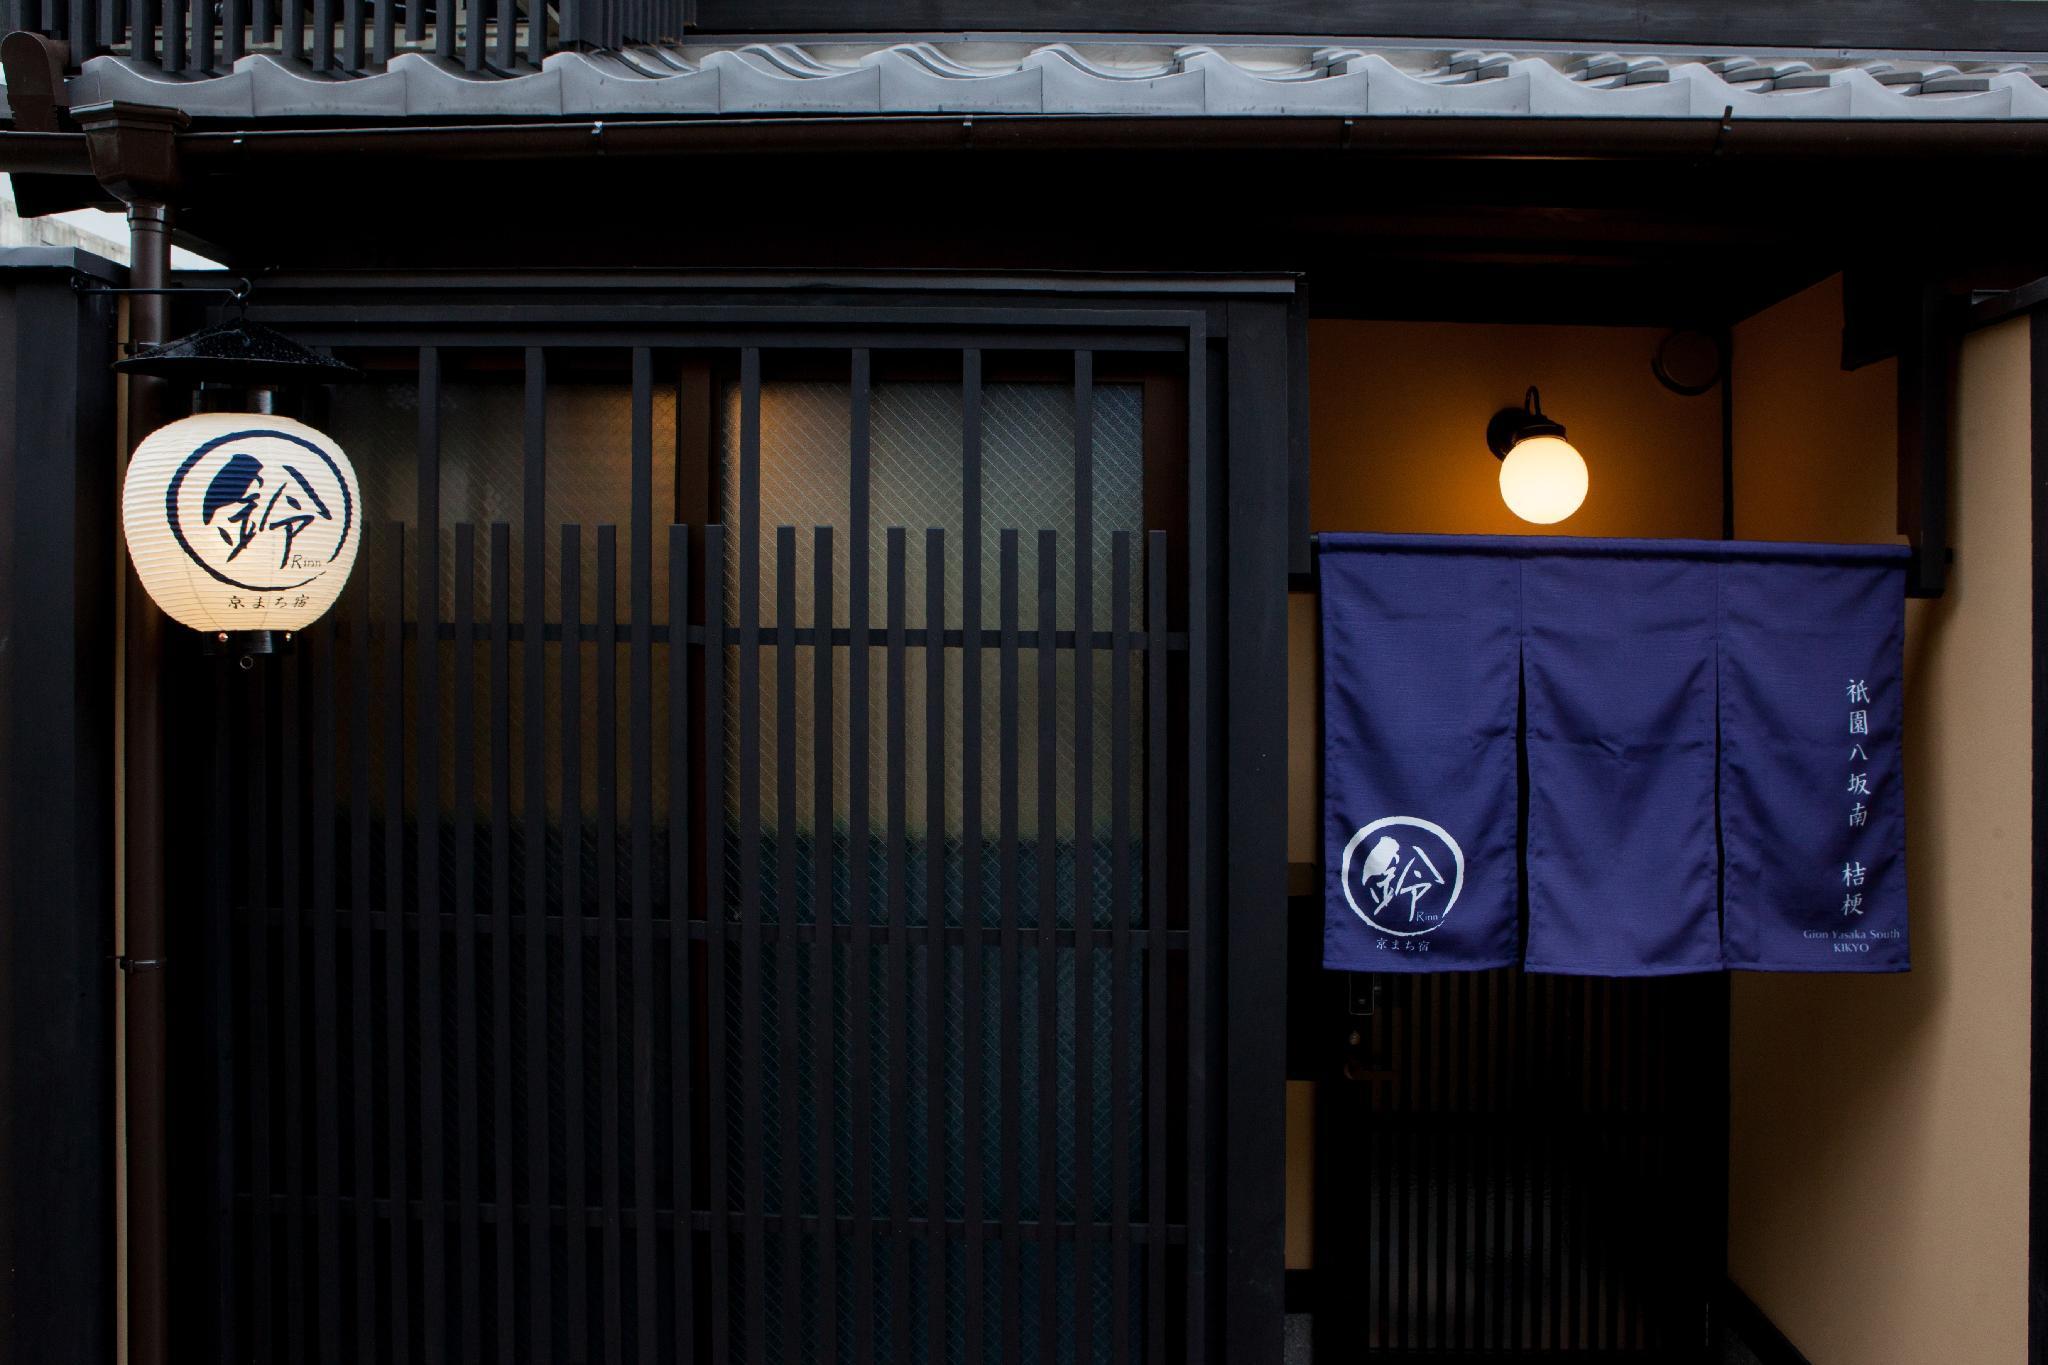 Rinn Gion Yasaka South KIKYO